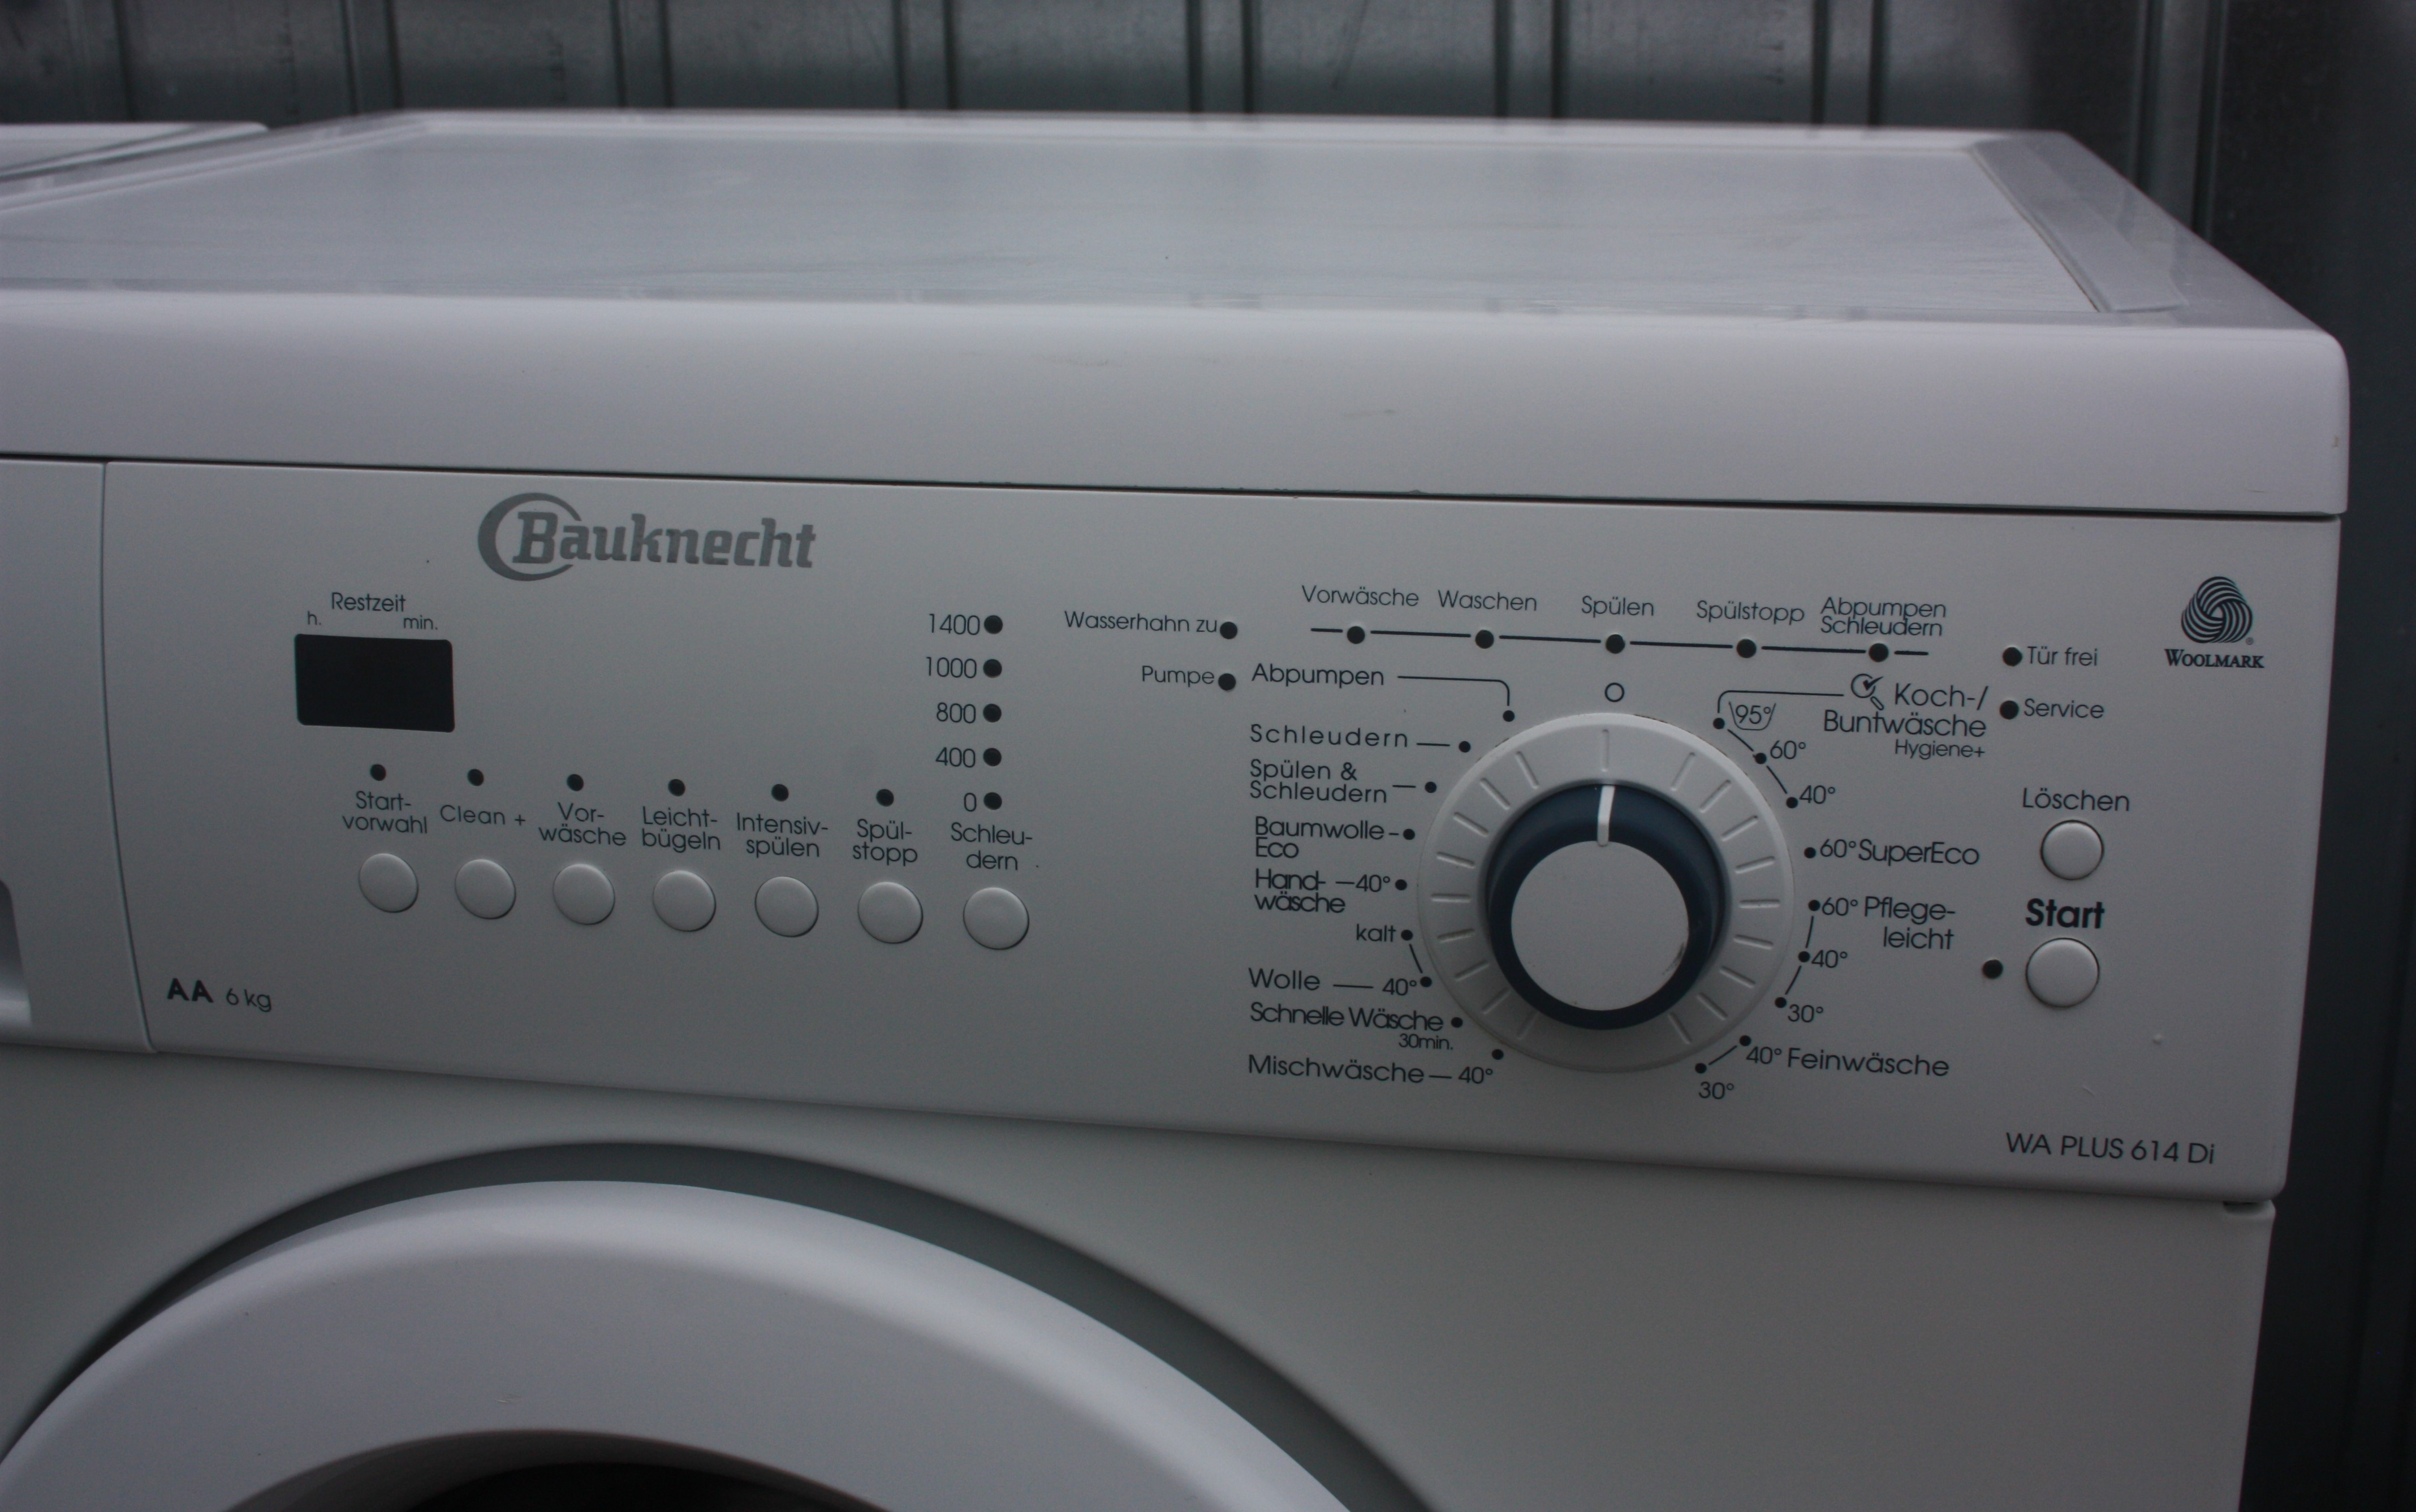 Pralka Bauknecht Wa Plus 614di 6 Kg 1400 Obr A Duzo Programow